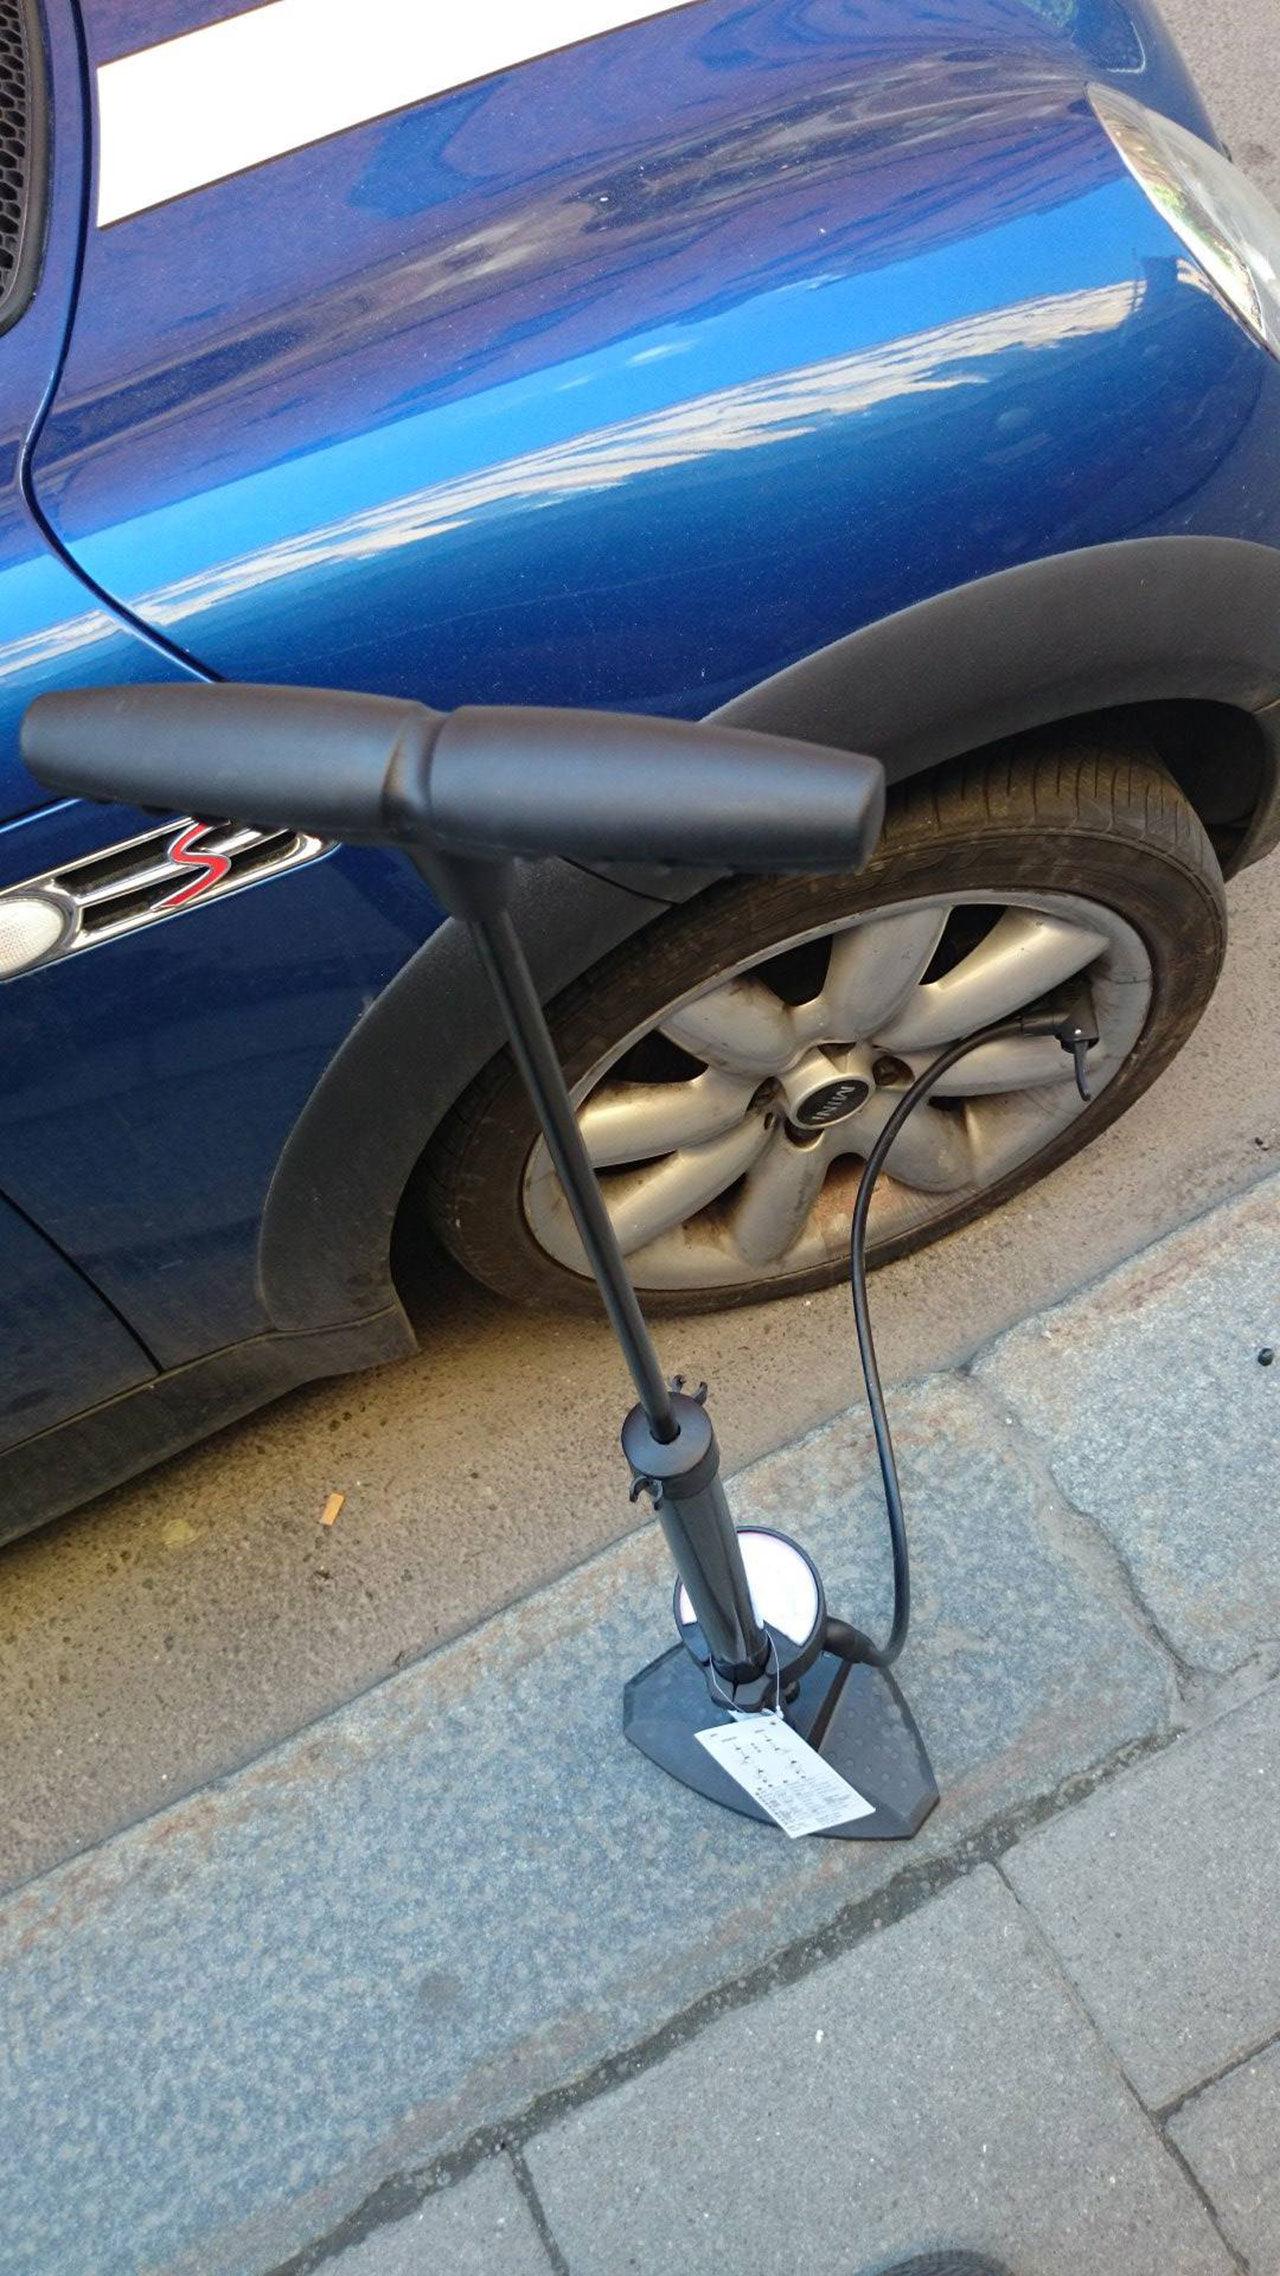 Pumpa bilen med cykelpumpen